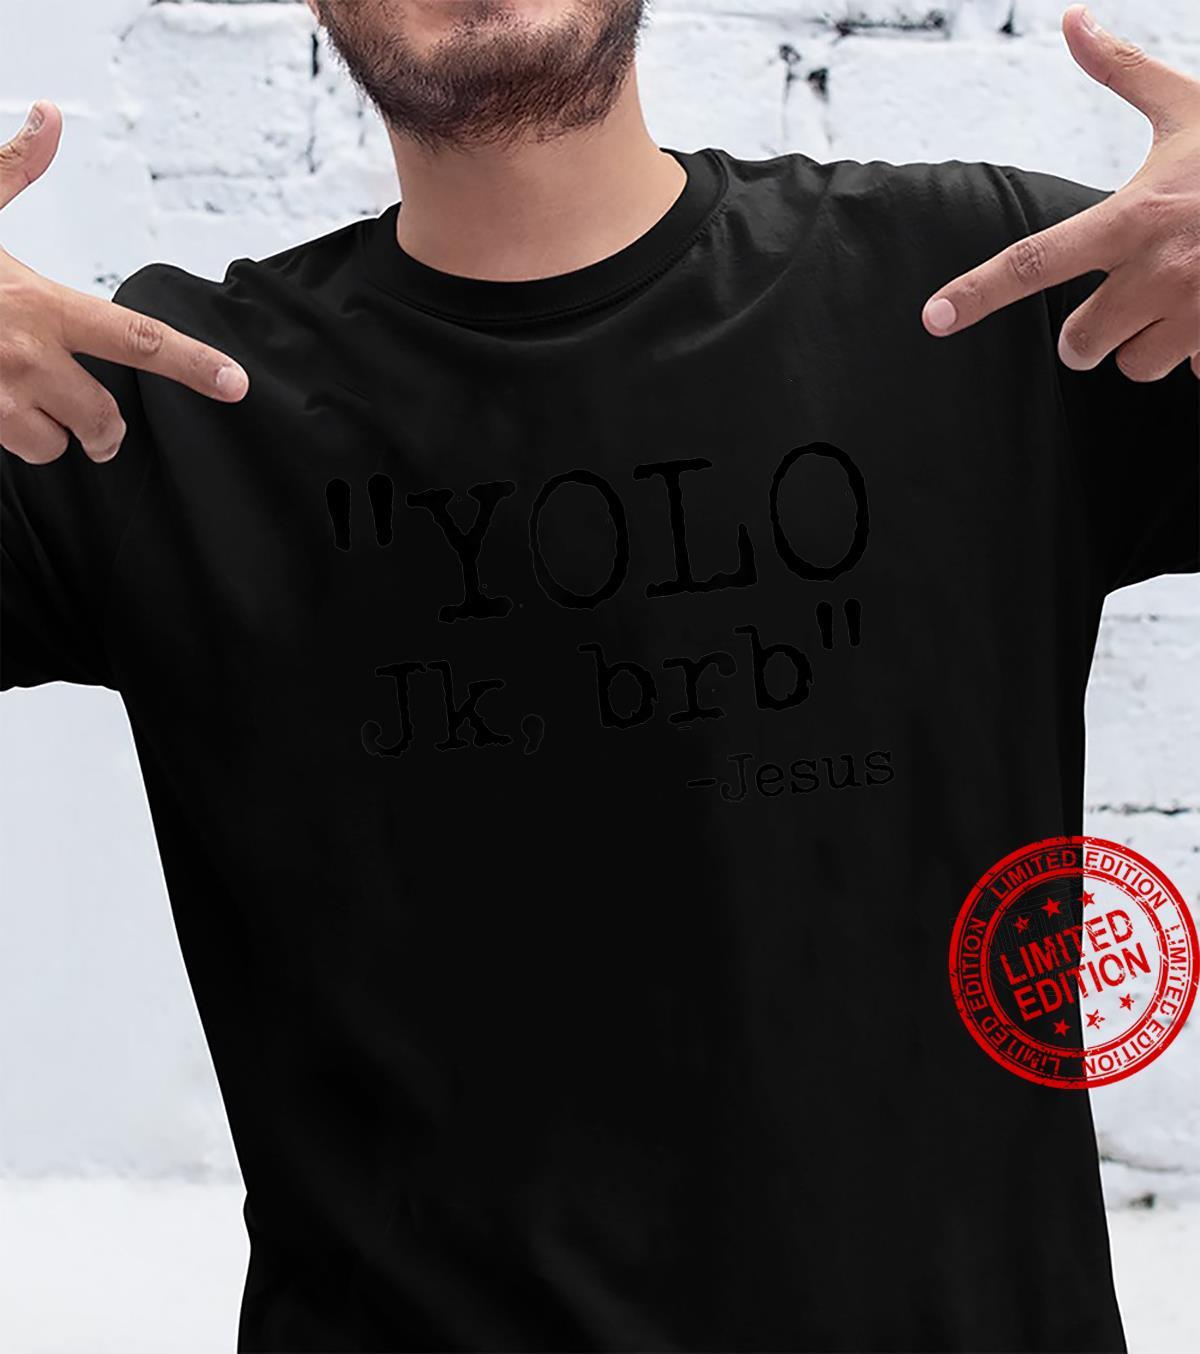 YOLO Jk BRB Jesus Christian Bible Verse Quotes Shirt